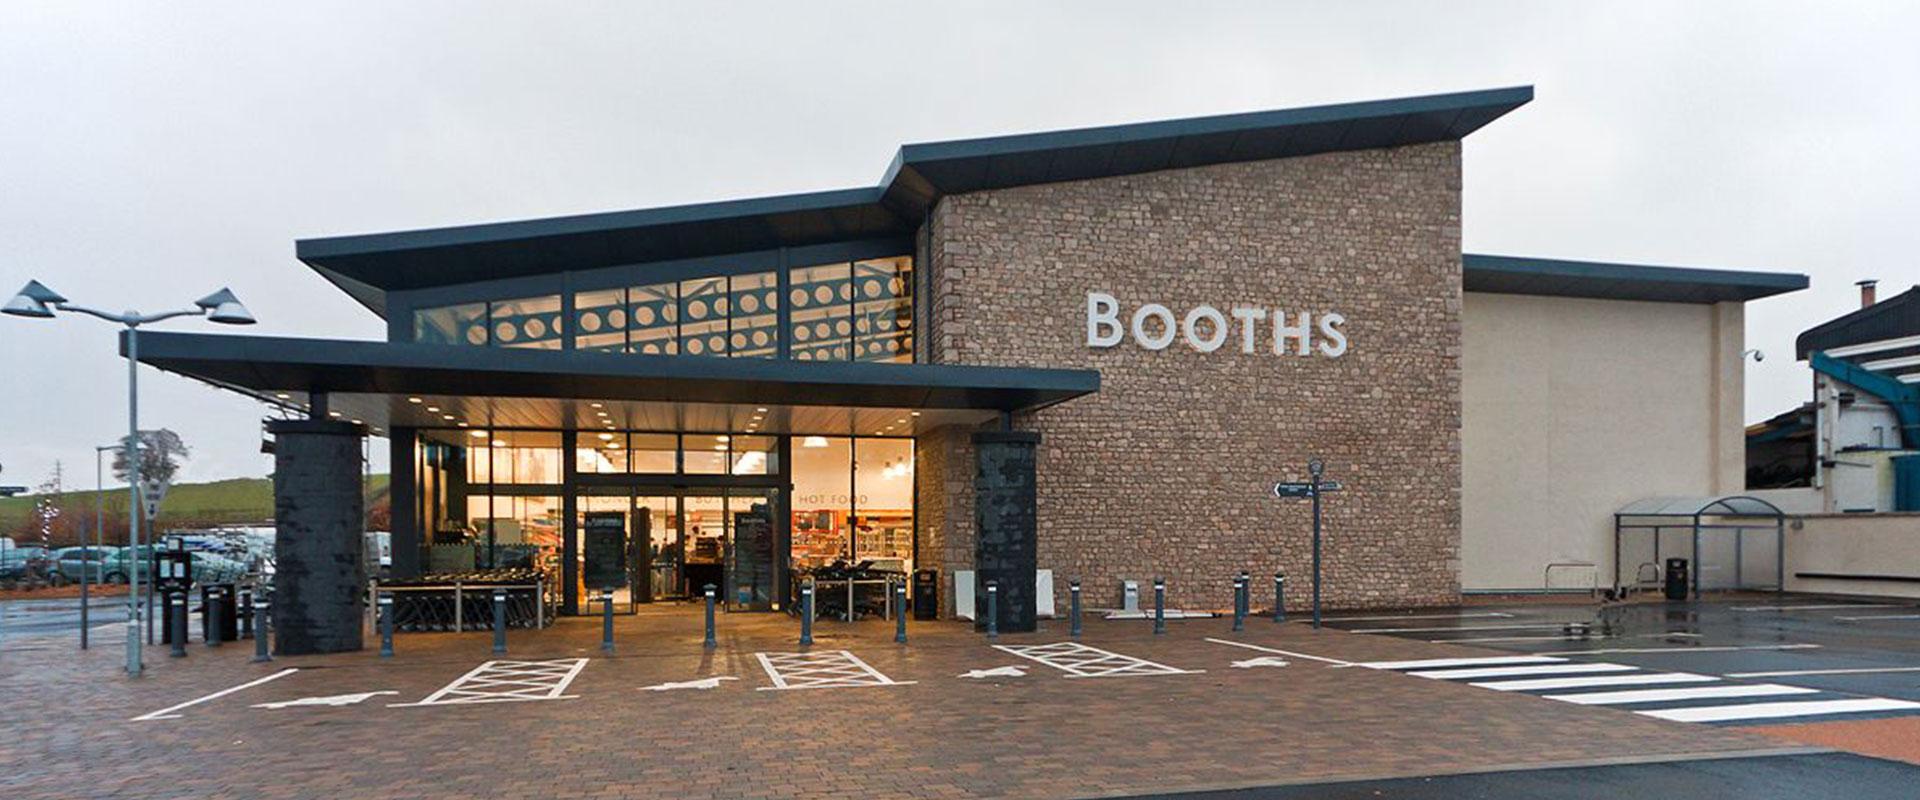 Booths Supermarket, Milnthorpe